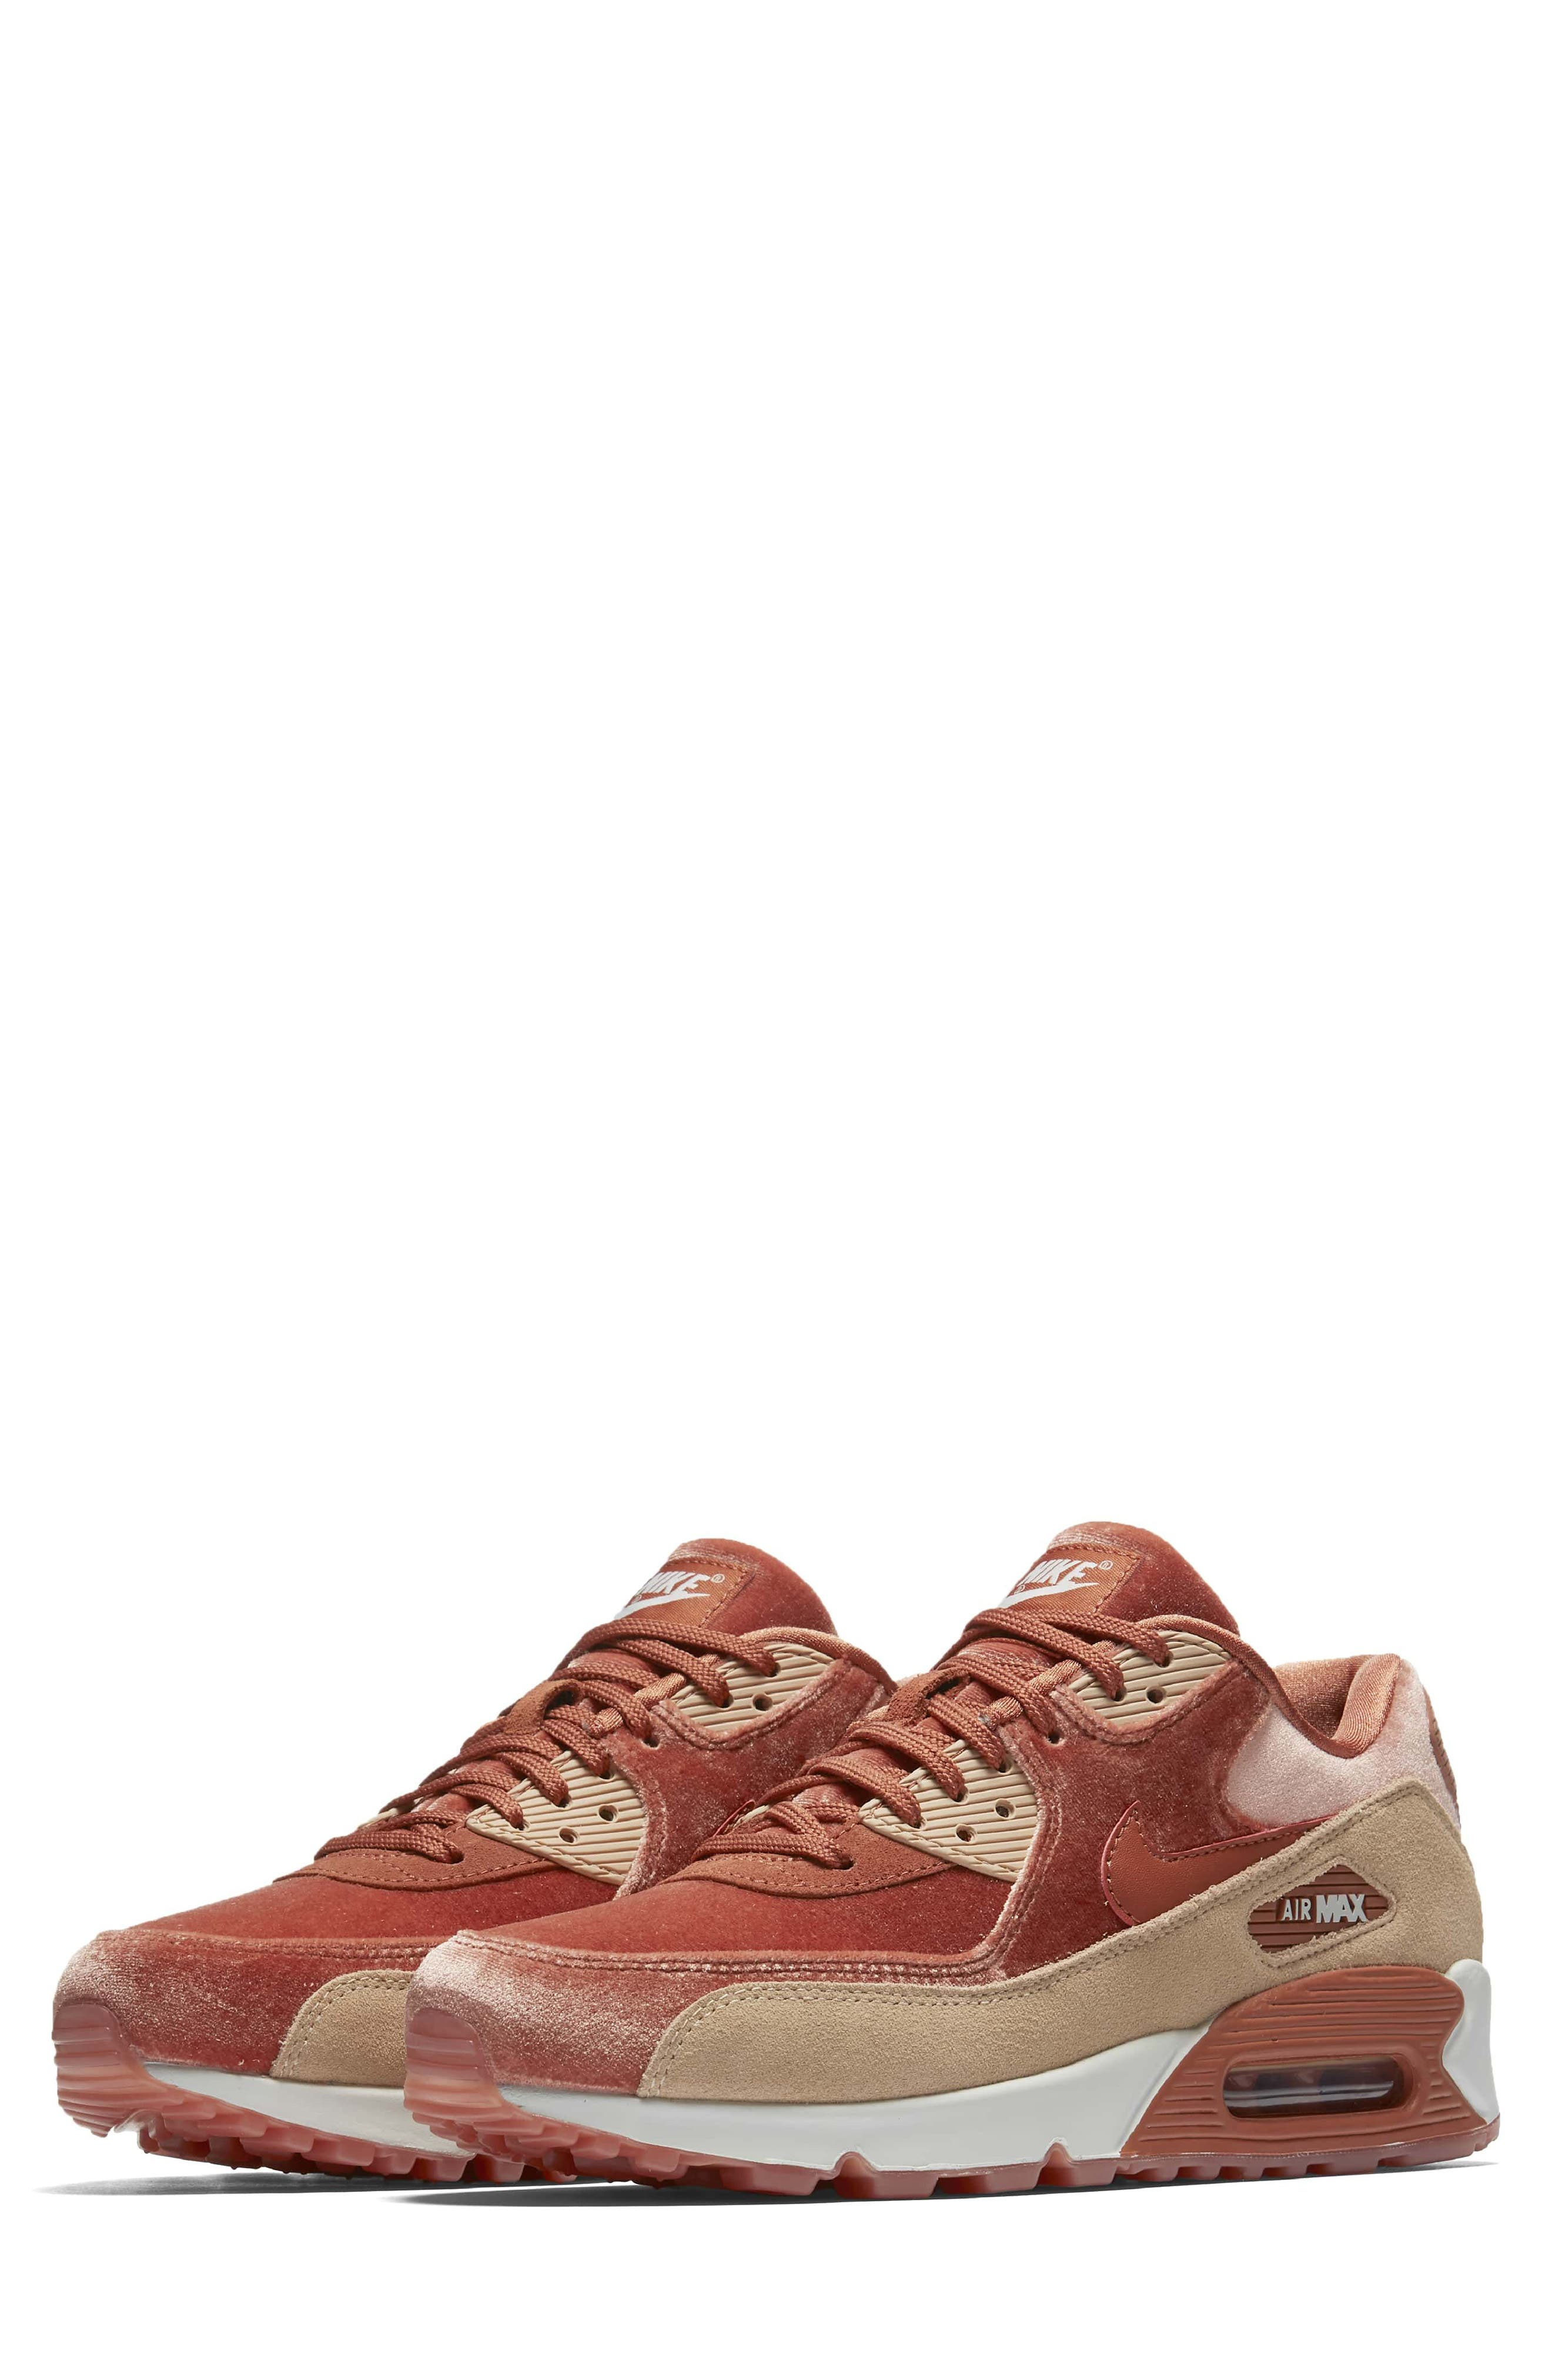 Nike Air Max 90 LX Sneaker (Women)